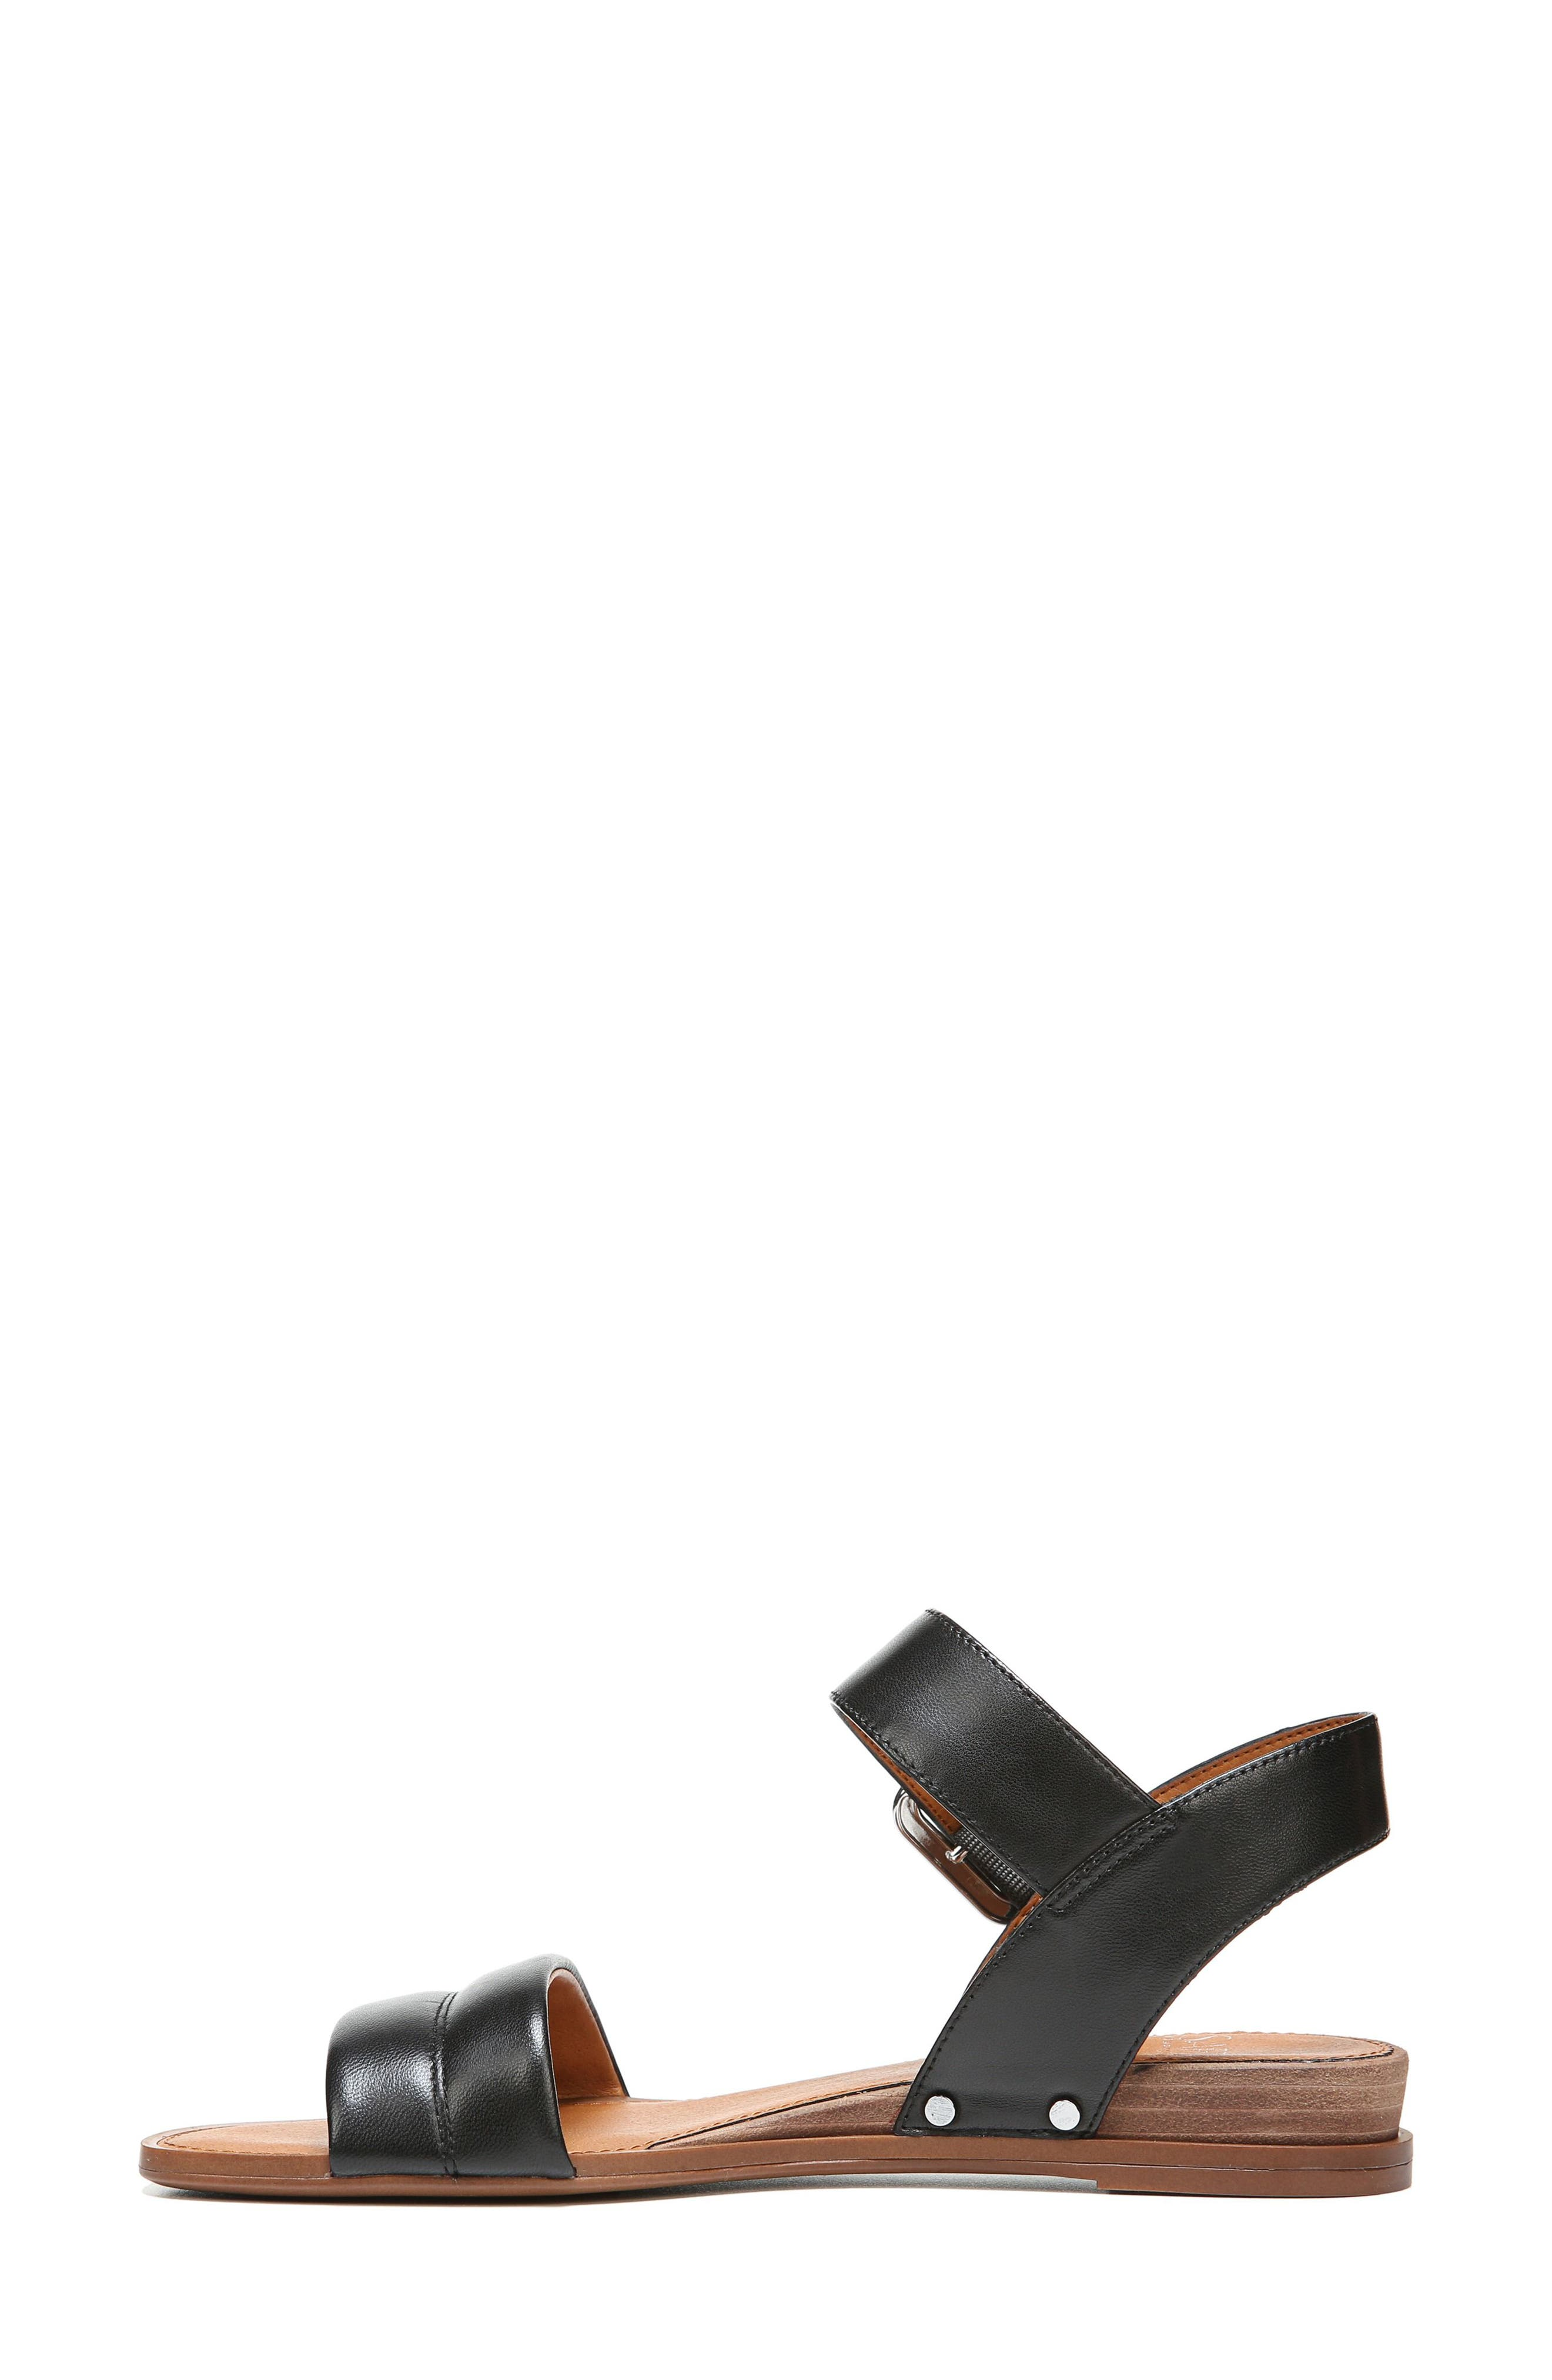 Patterson Low Wedge Sandal,                             Alternate thumbnail 15, color,